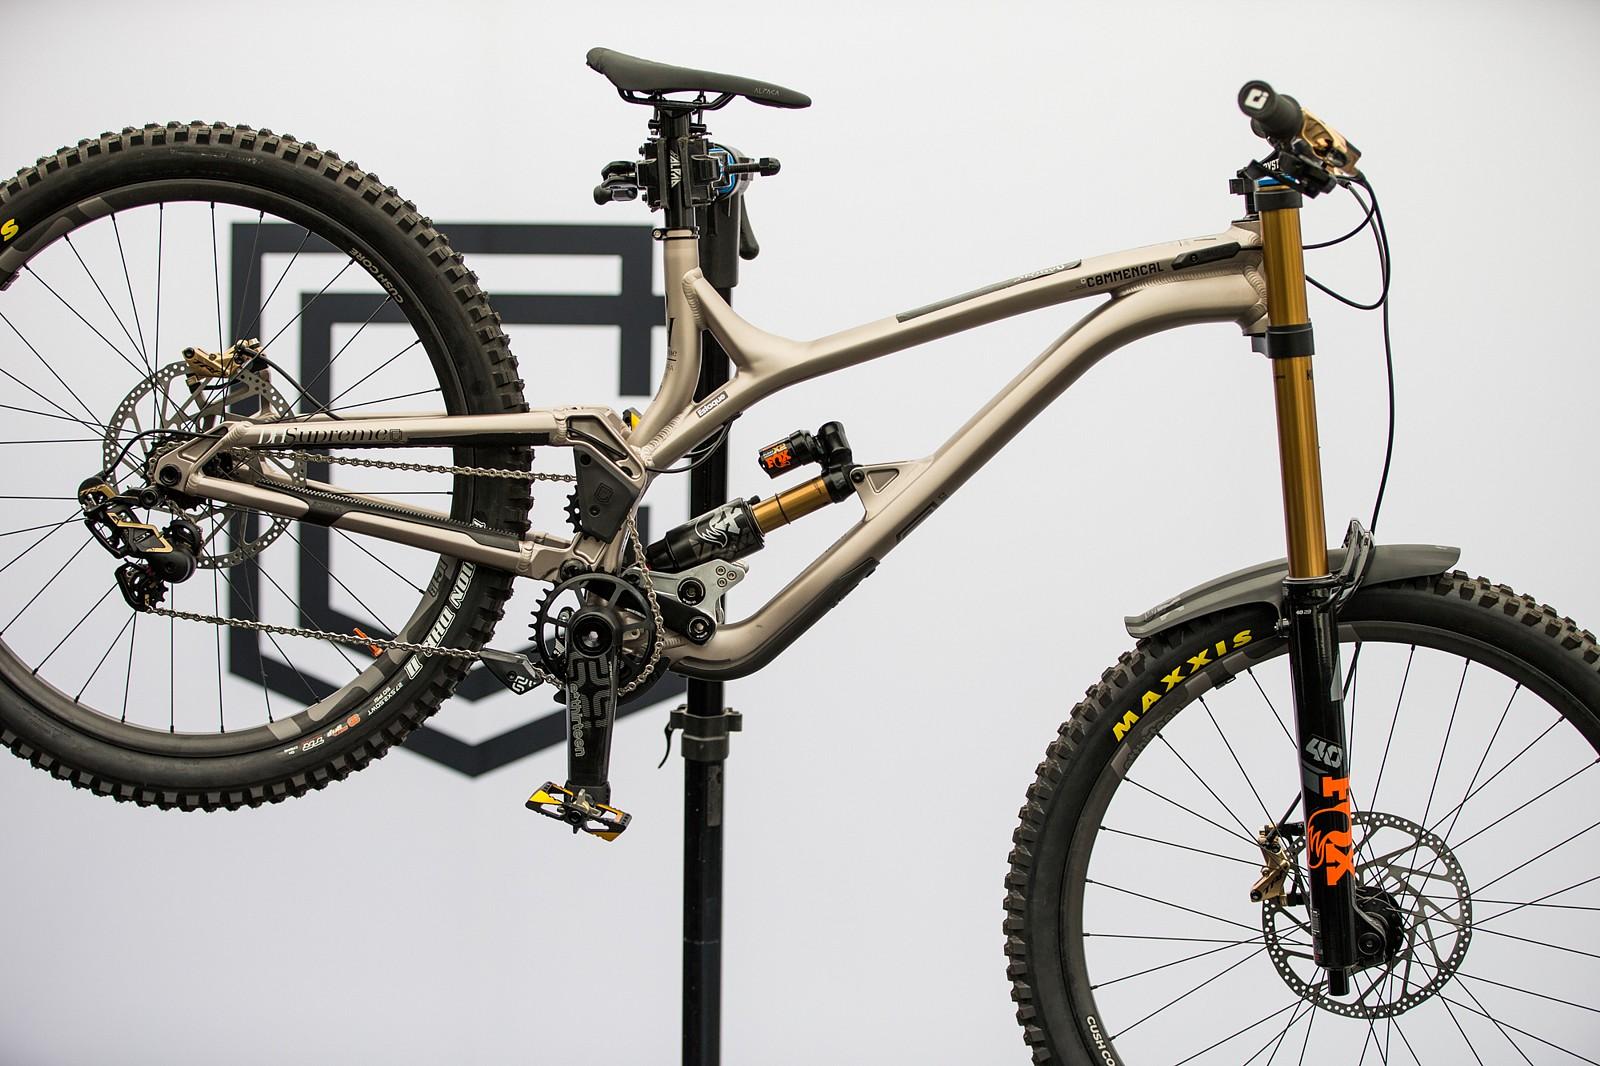 Commencal 100% race bike - PIT BITS - Les Gets World Cup Downhill 2021 - Mountain Biking Pictures - Vital MTB